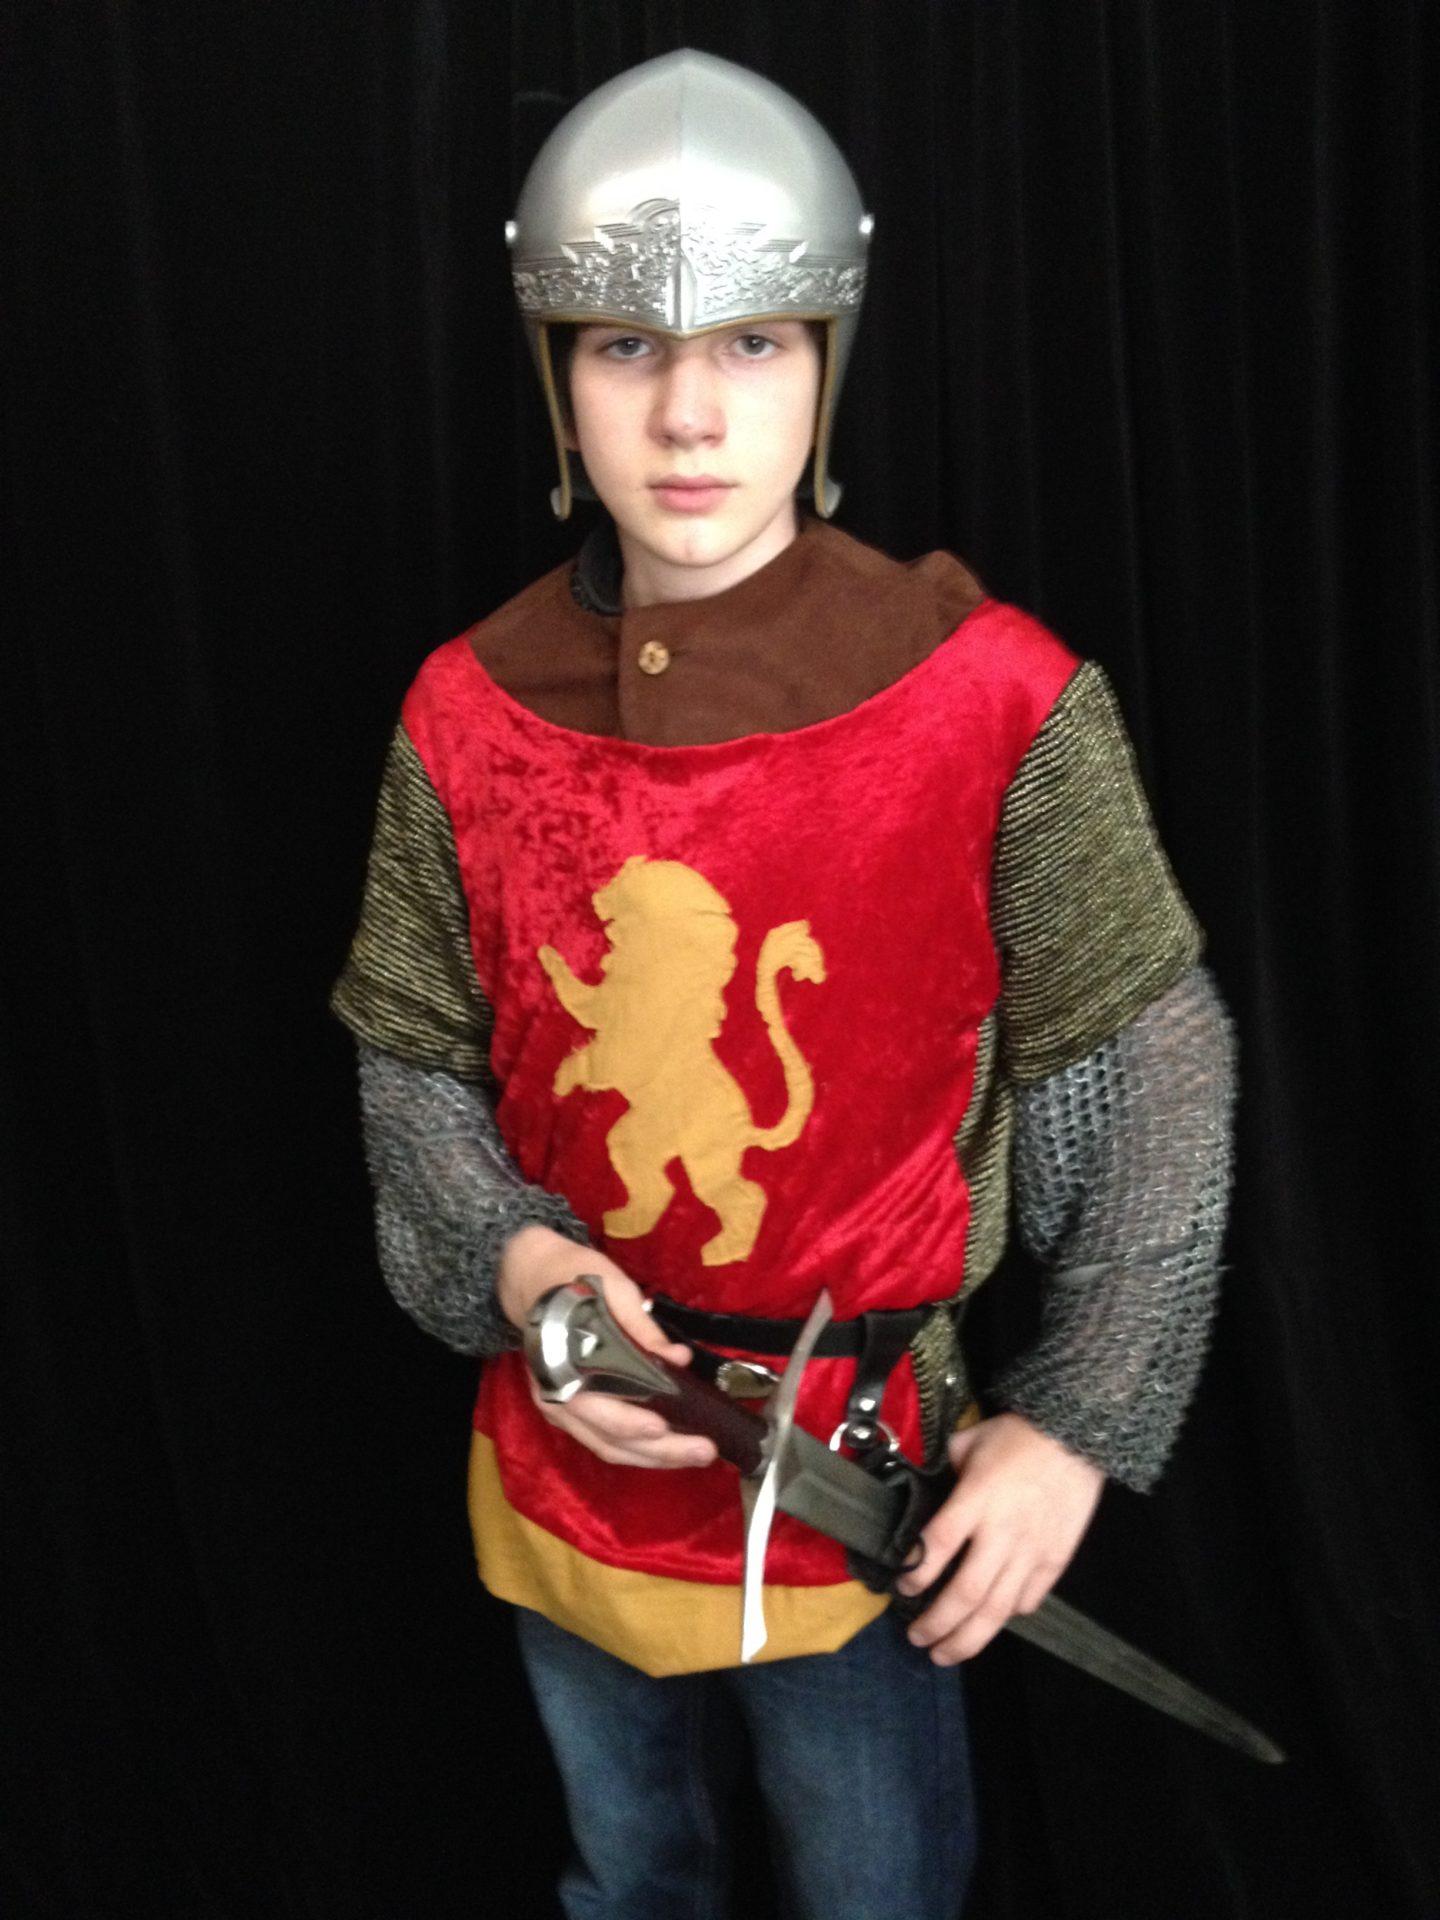 Narnia LWW Edmund Pevensie Battle Outfit vs2